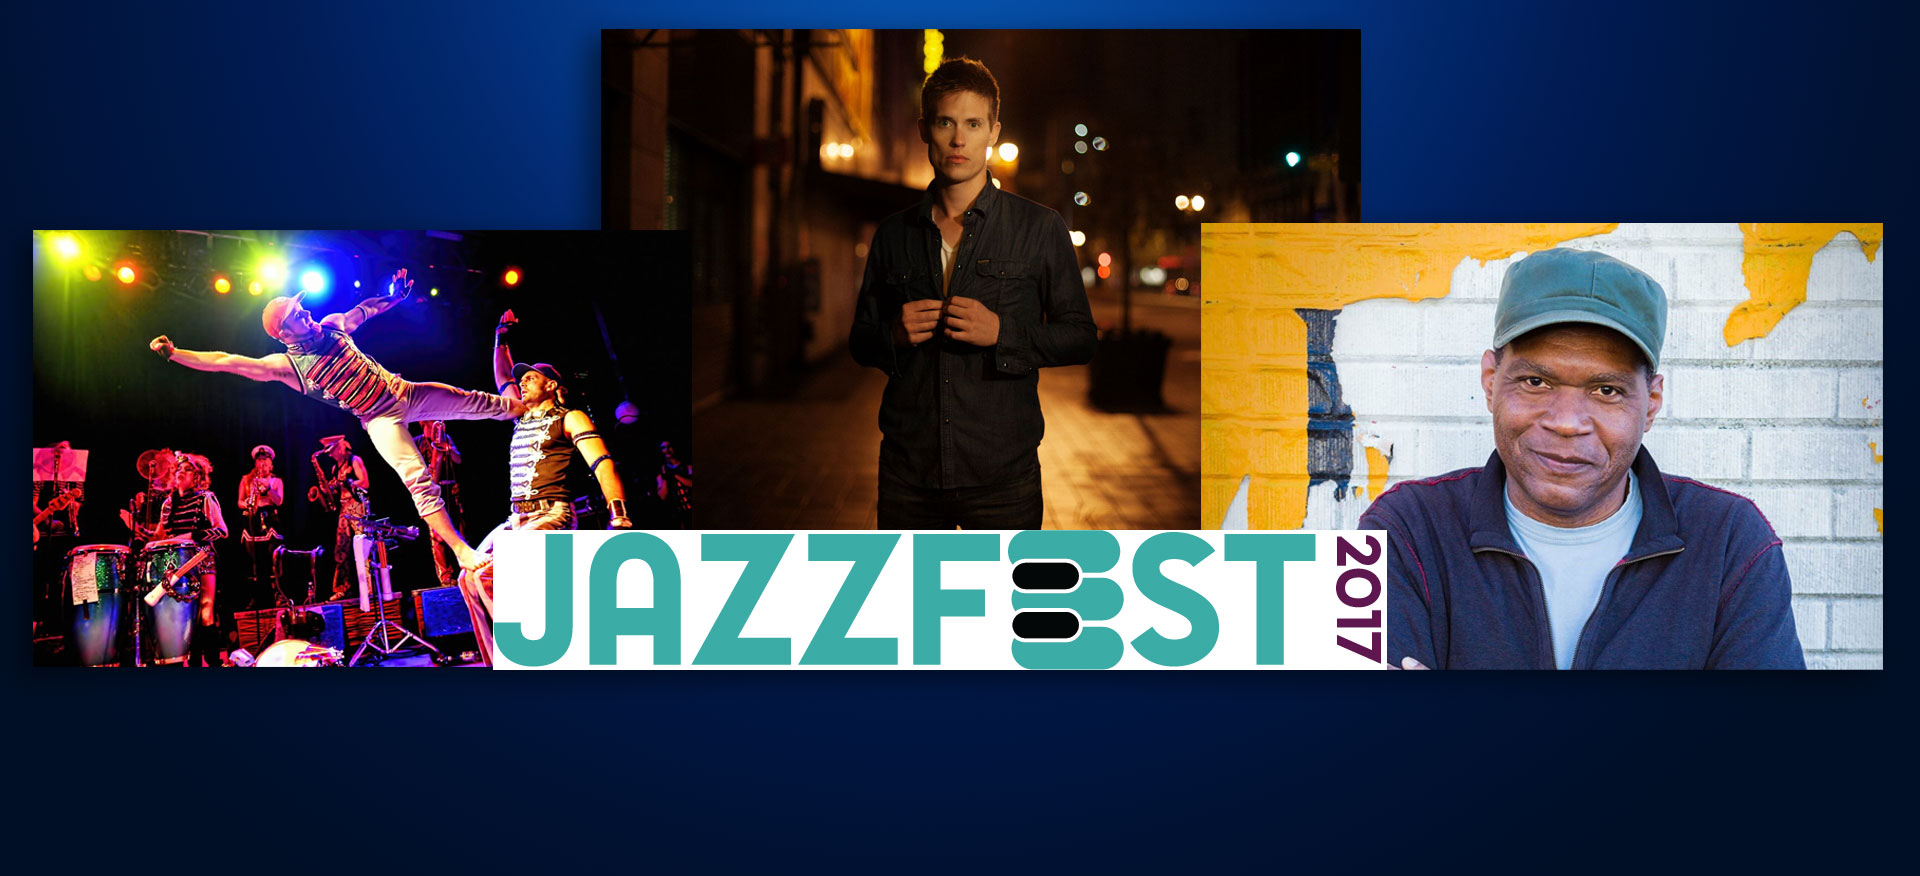 JazzFest 2017 Jonny Lang Robert Cray Band MarchFourth